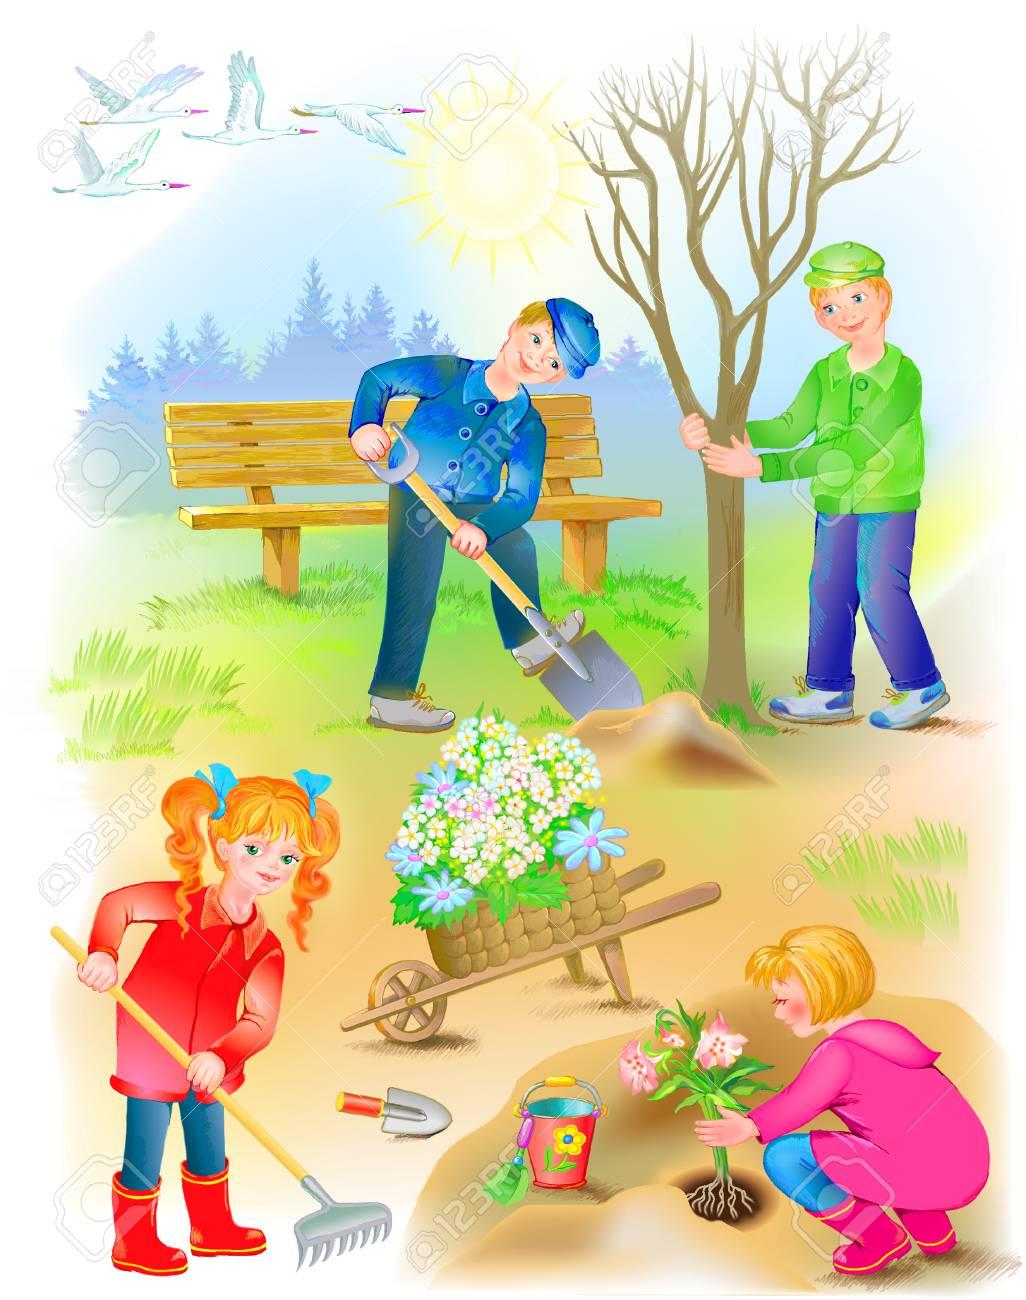 Illustration Of Children Working In The Spring Garden Image